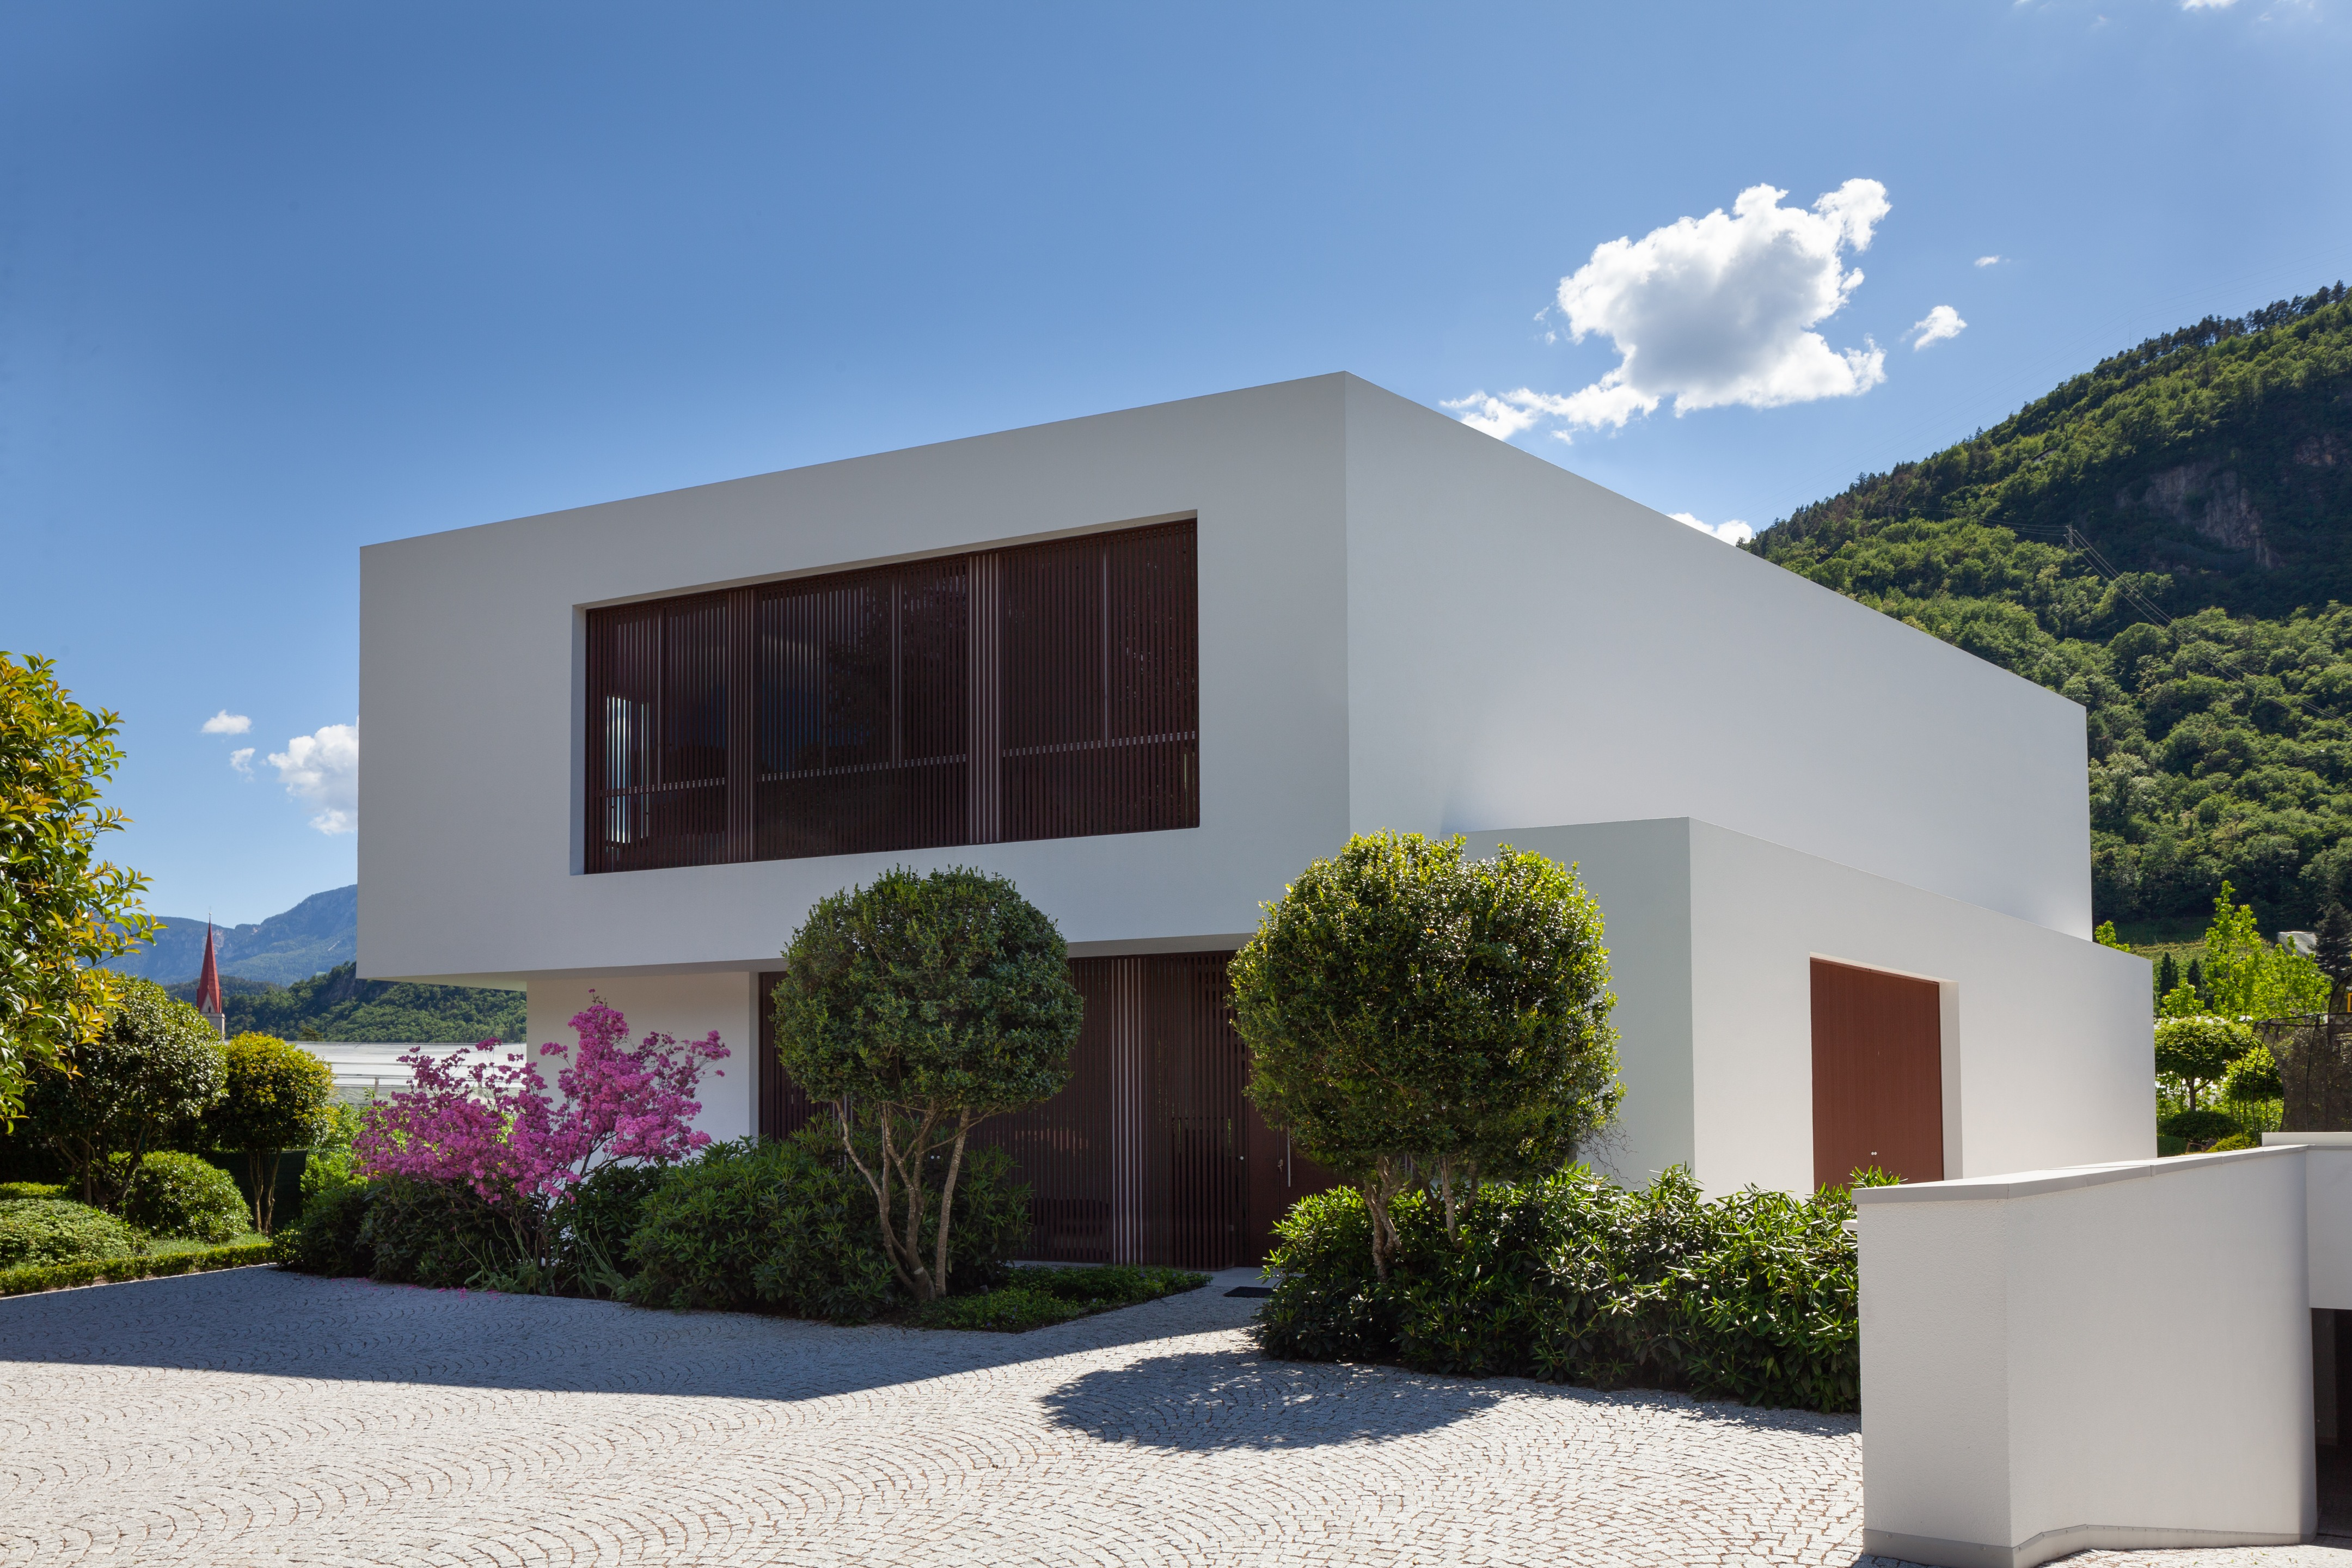 Rampe Garage In Porfido house g   monovolume architecture + design